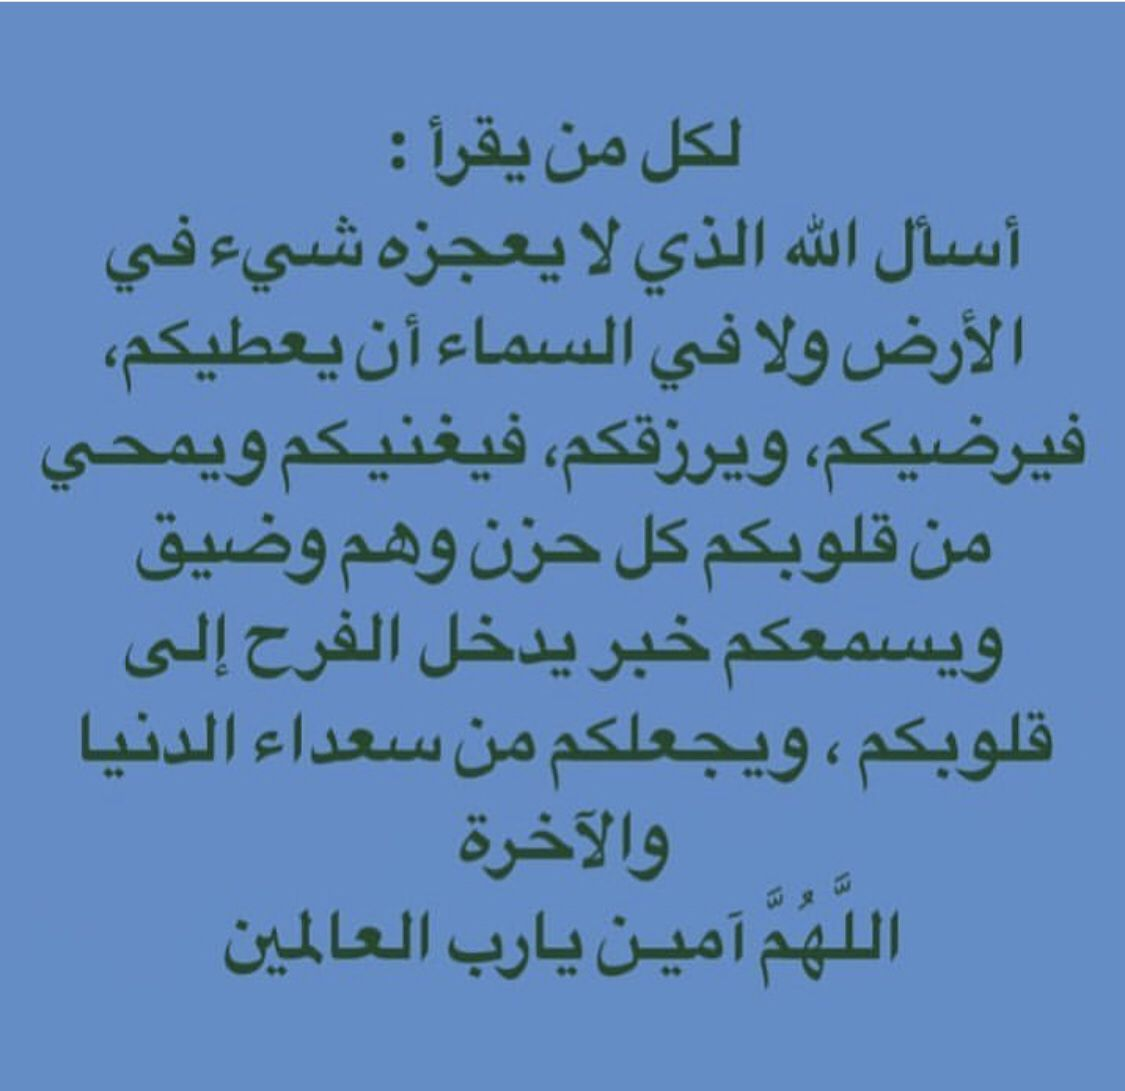 Pin By Ji Ji On أدعية Islam Me Quotes Prayers